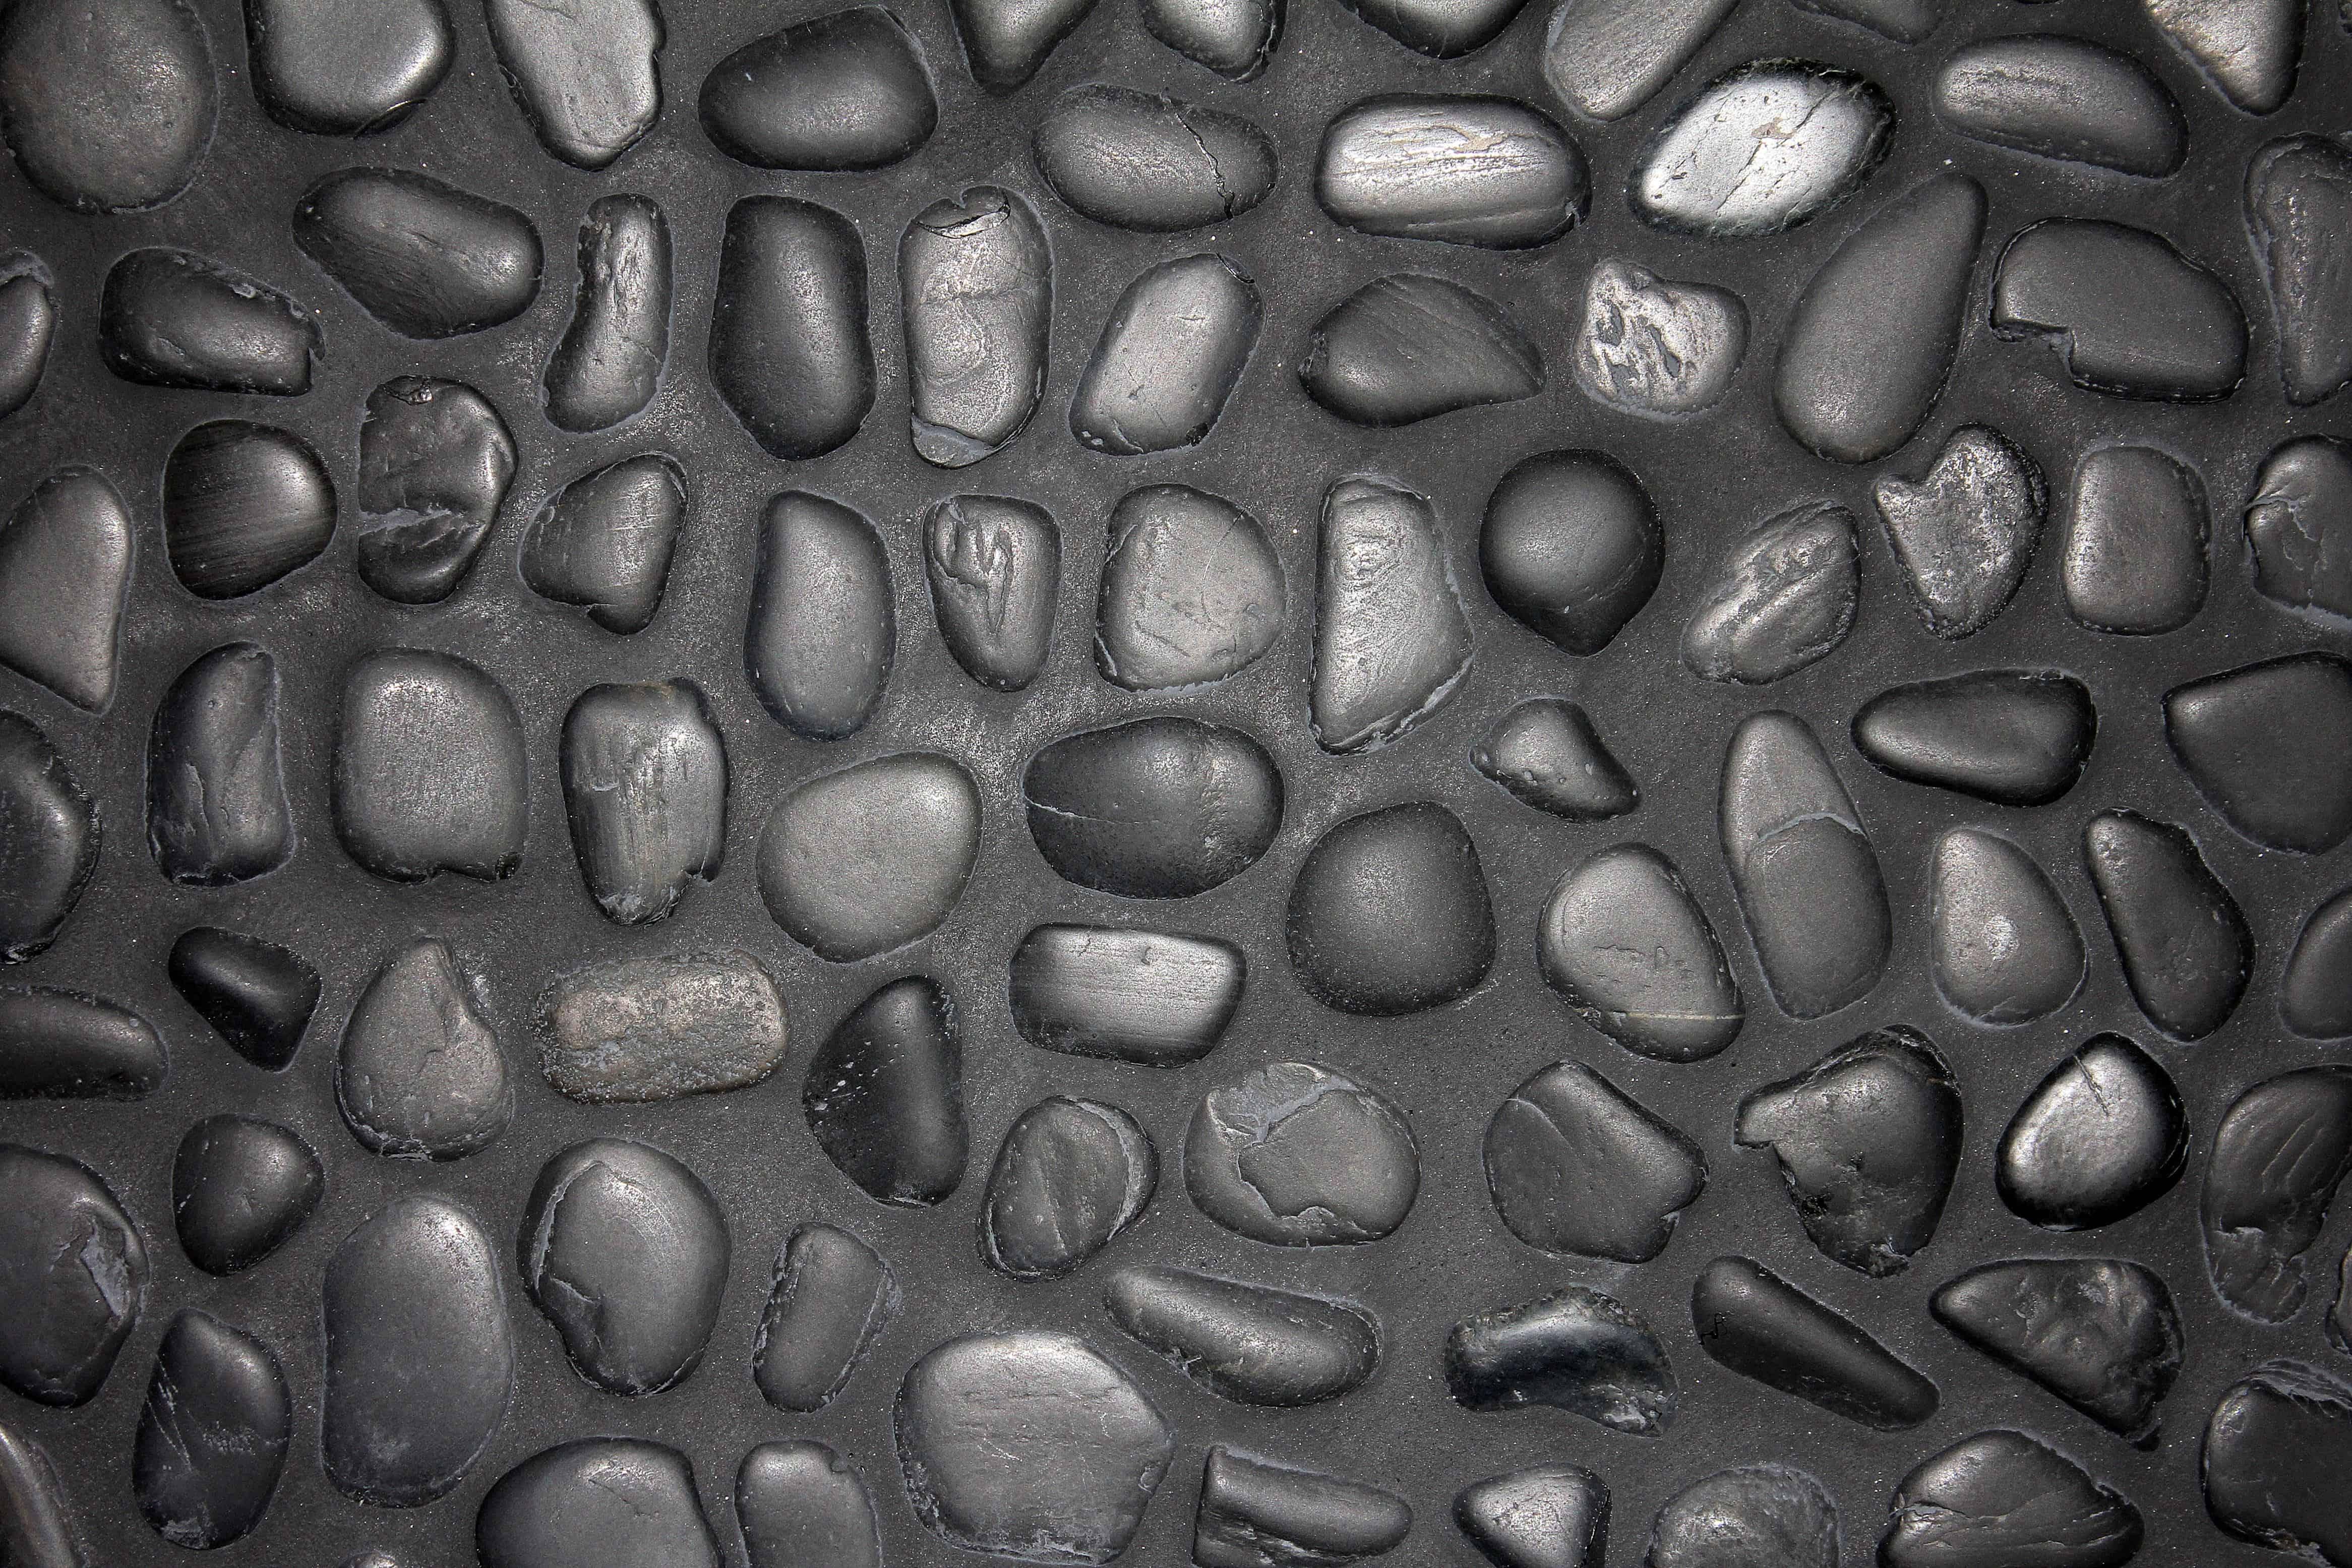 Free picture black stone monochrome pattern surface